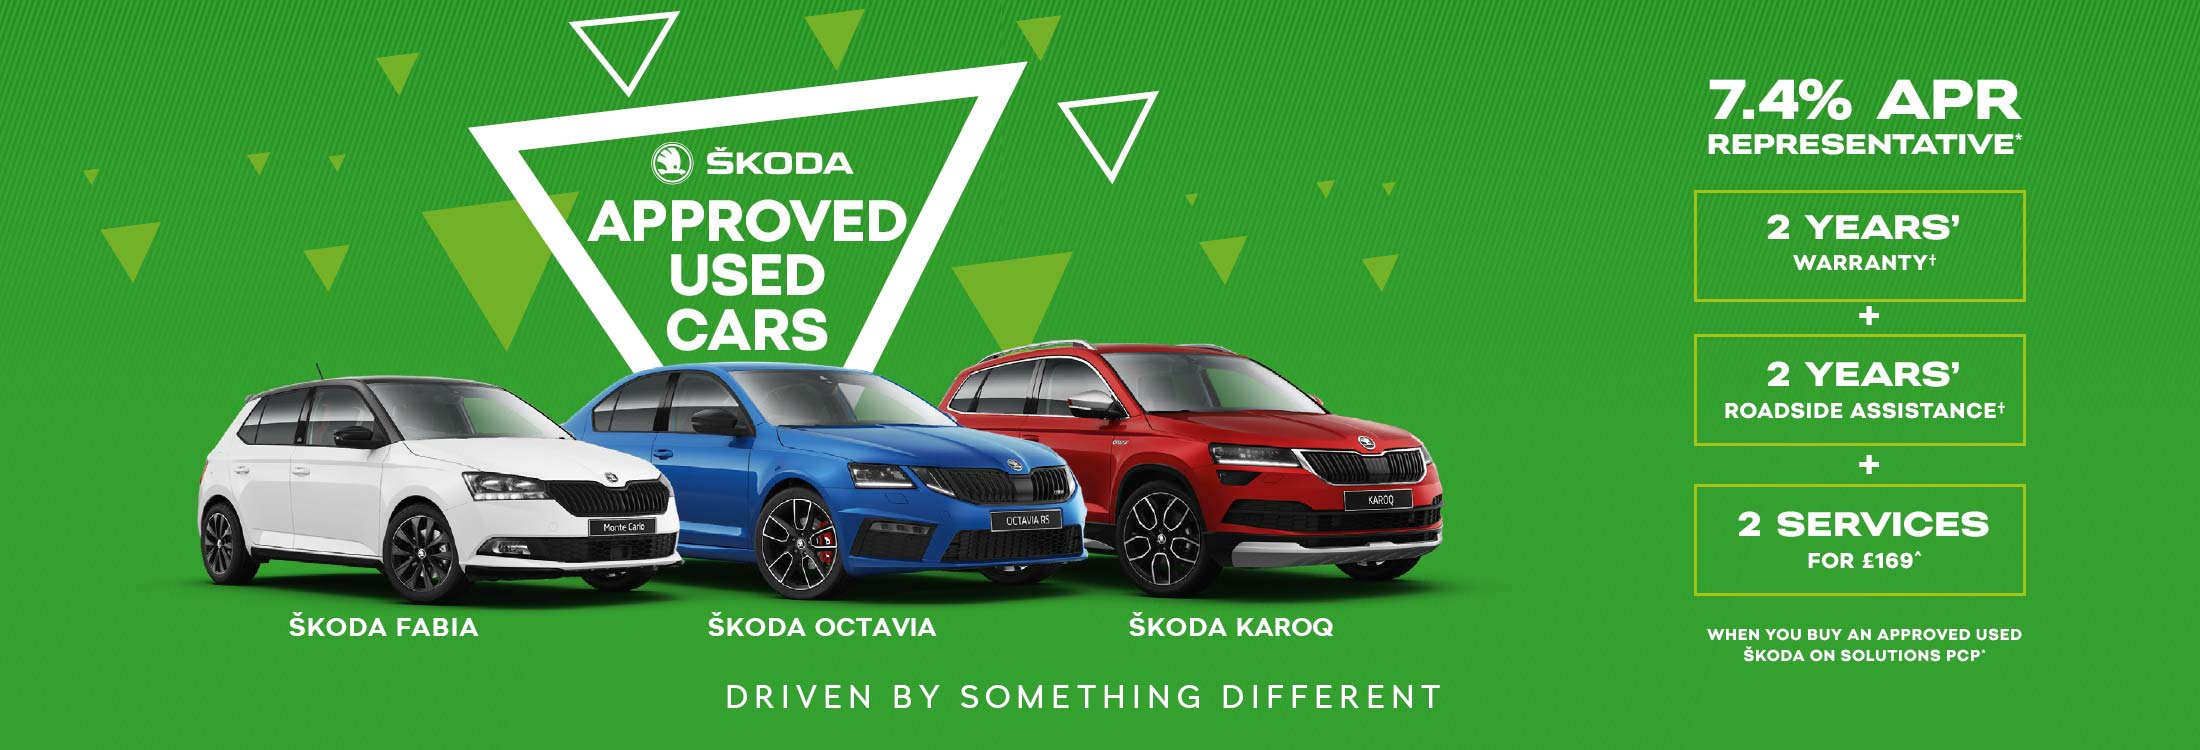 skoda-approved-used-cars